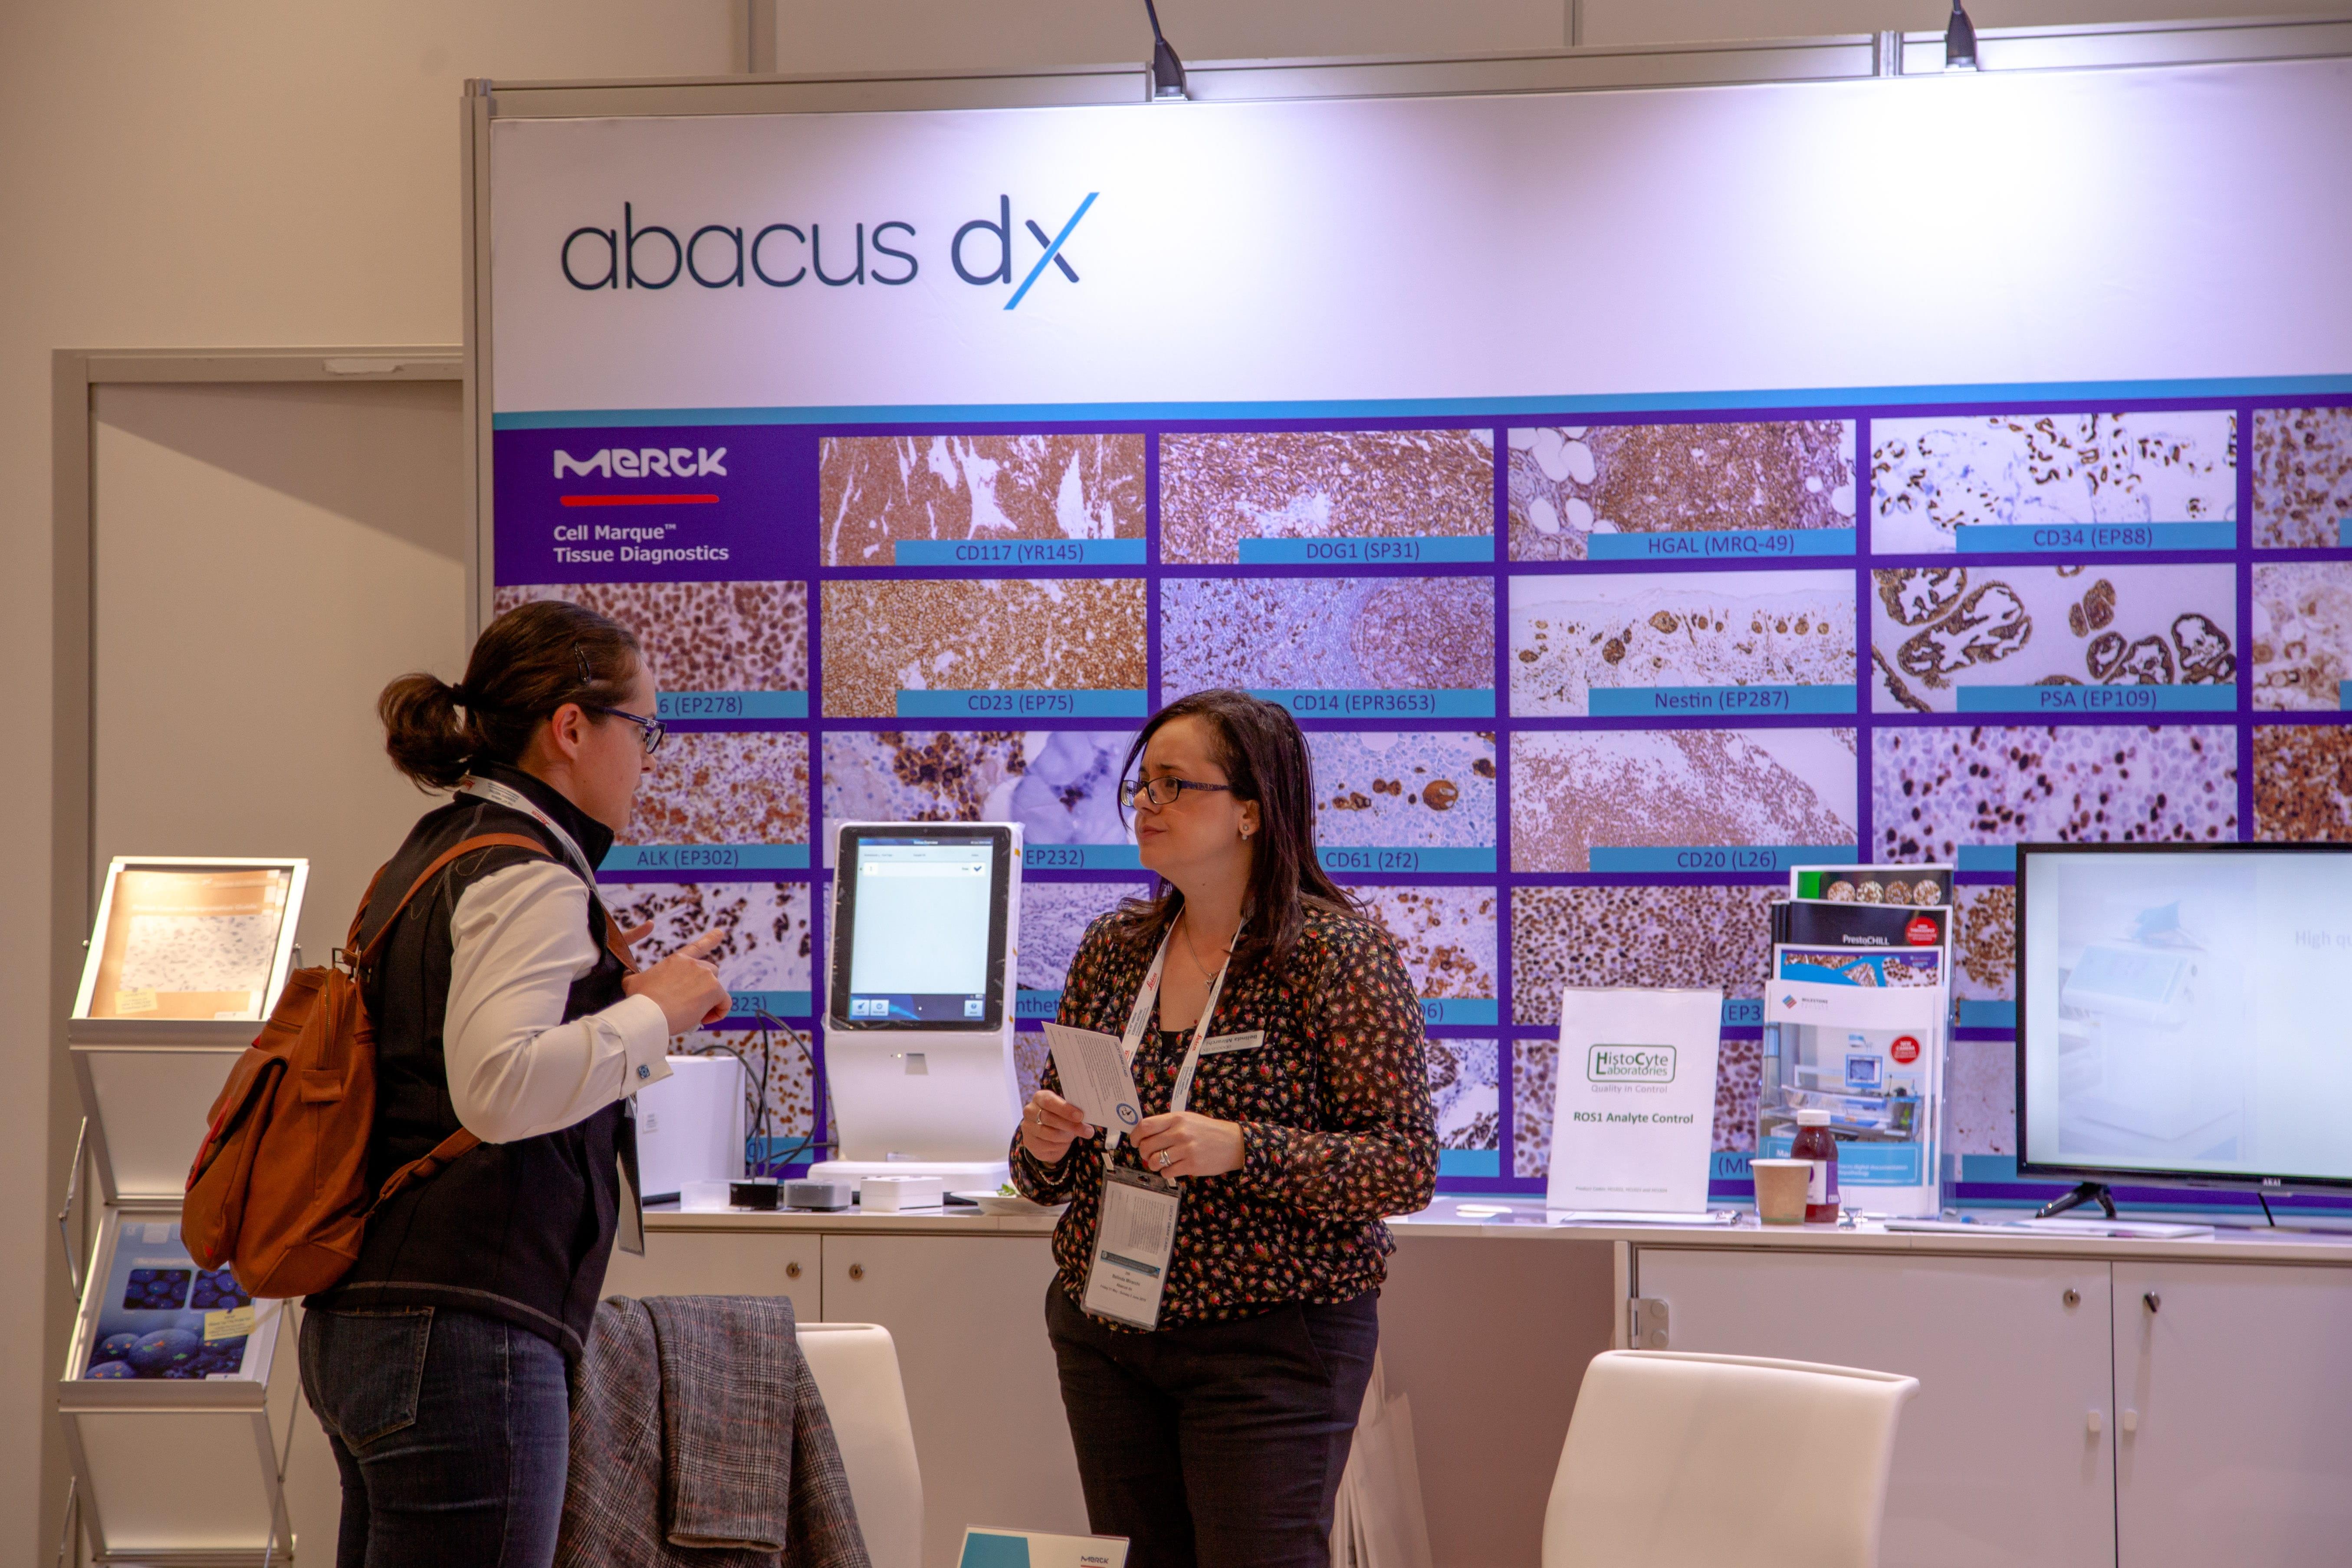 Abacus dx - Exhibitor